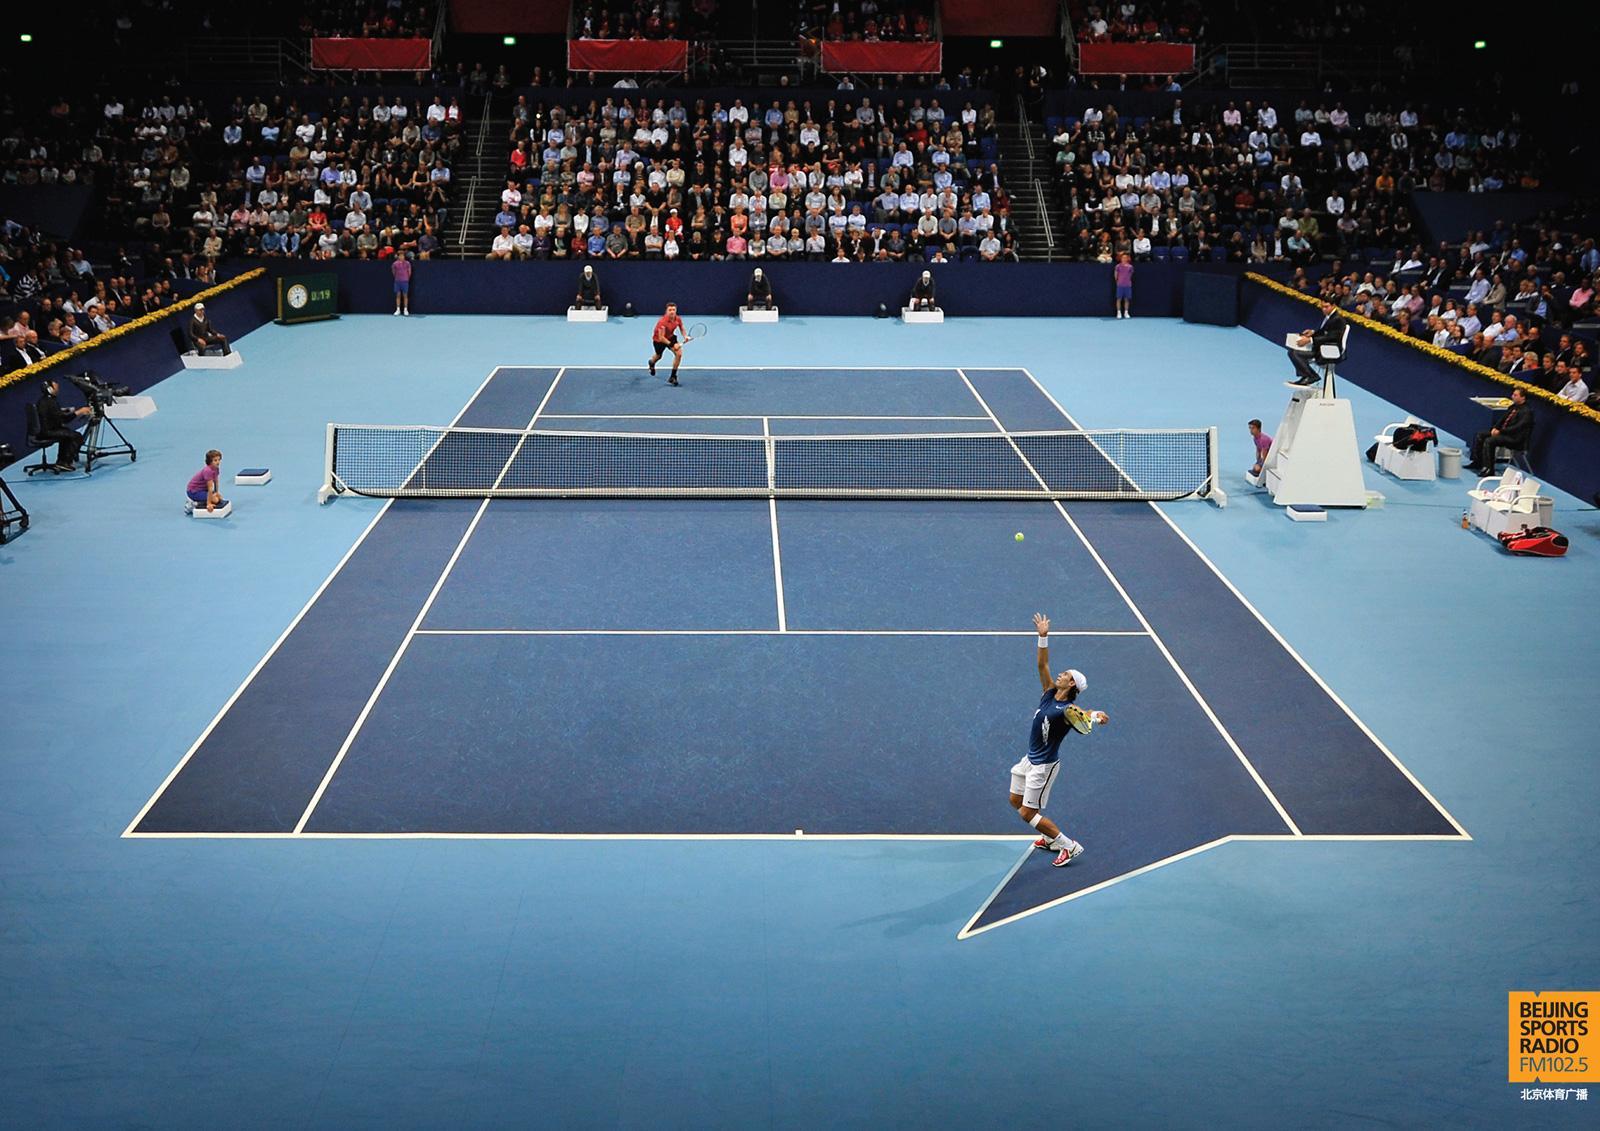 Beijing Sports Radio: Tennis | Ads of the World™